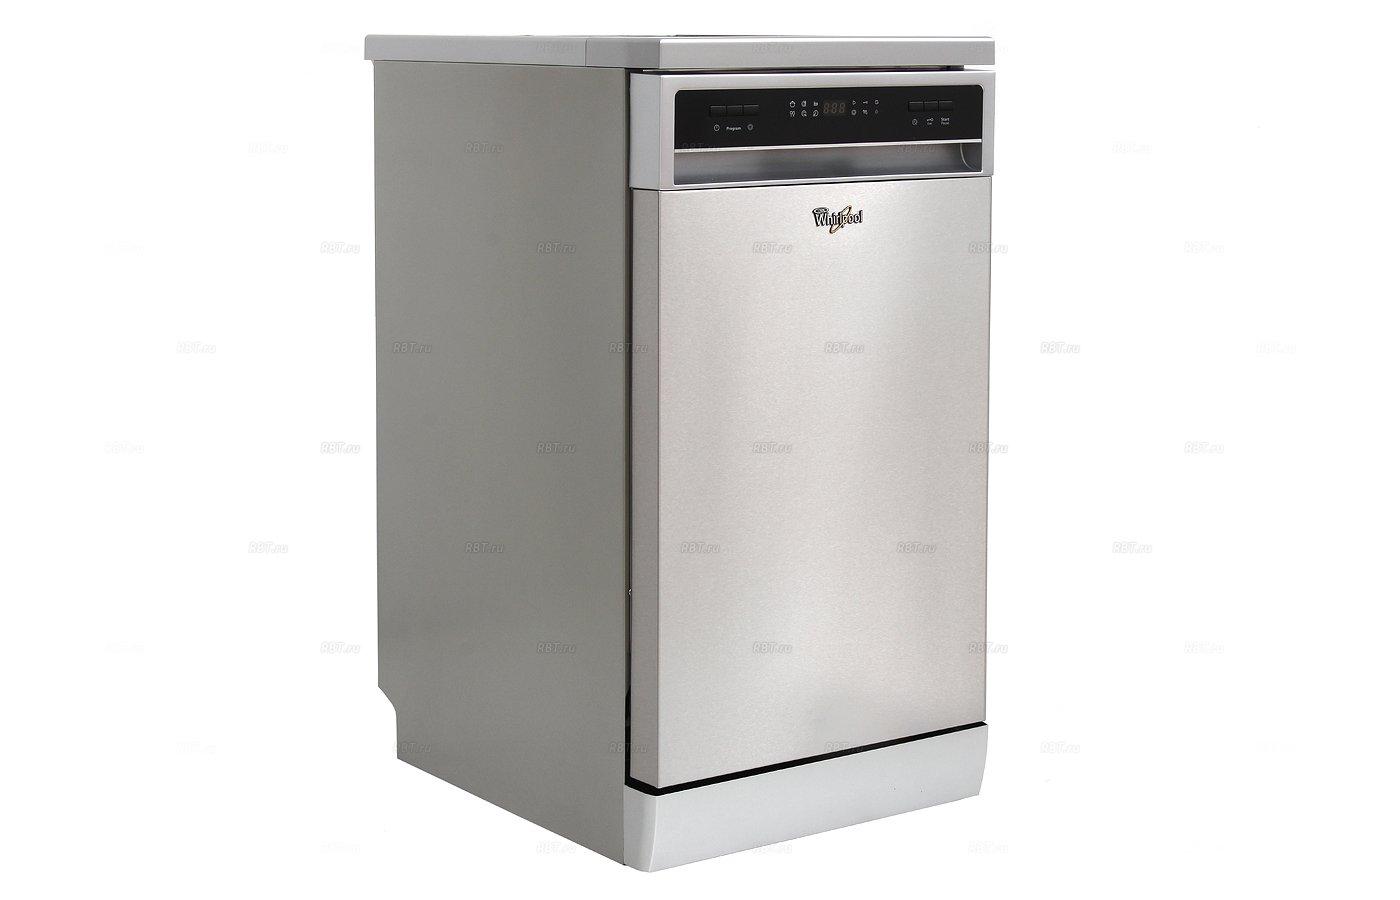 Посудомоечная машина WHIRLPOOL ADPF 851 IX